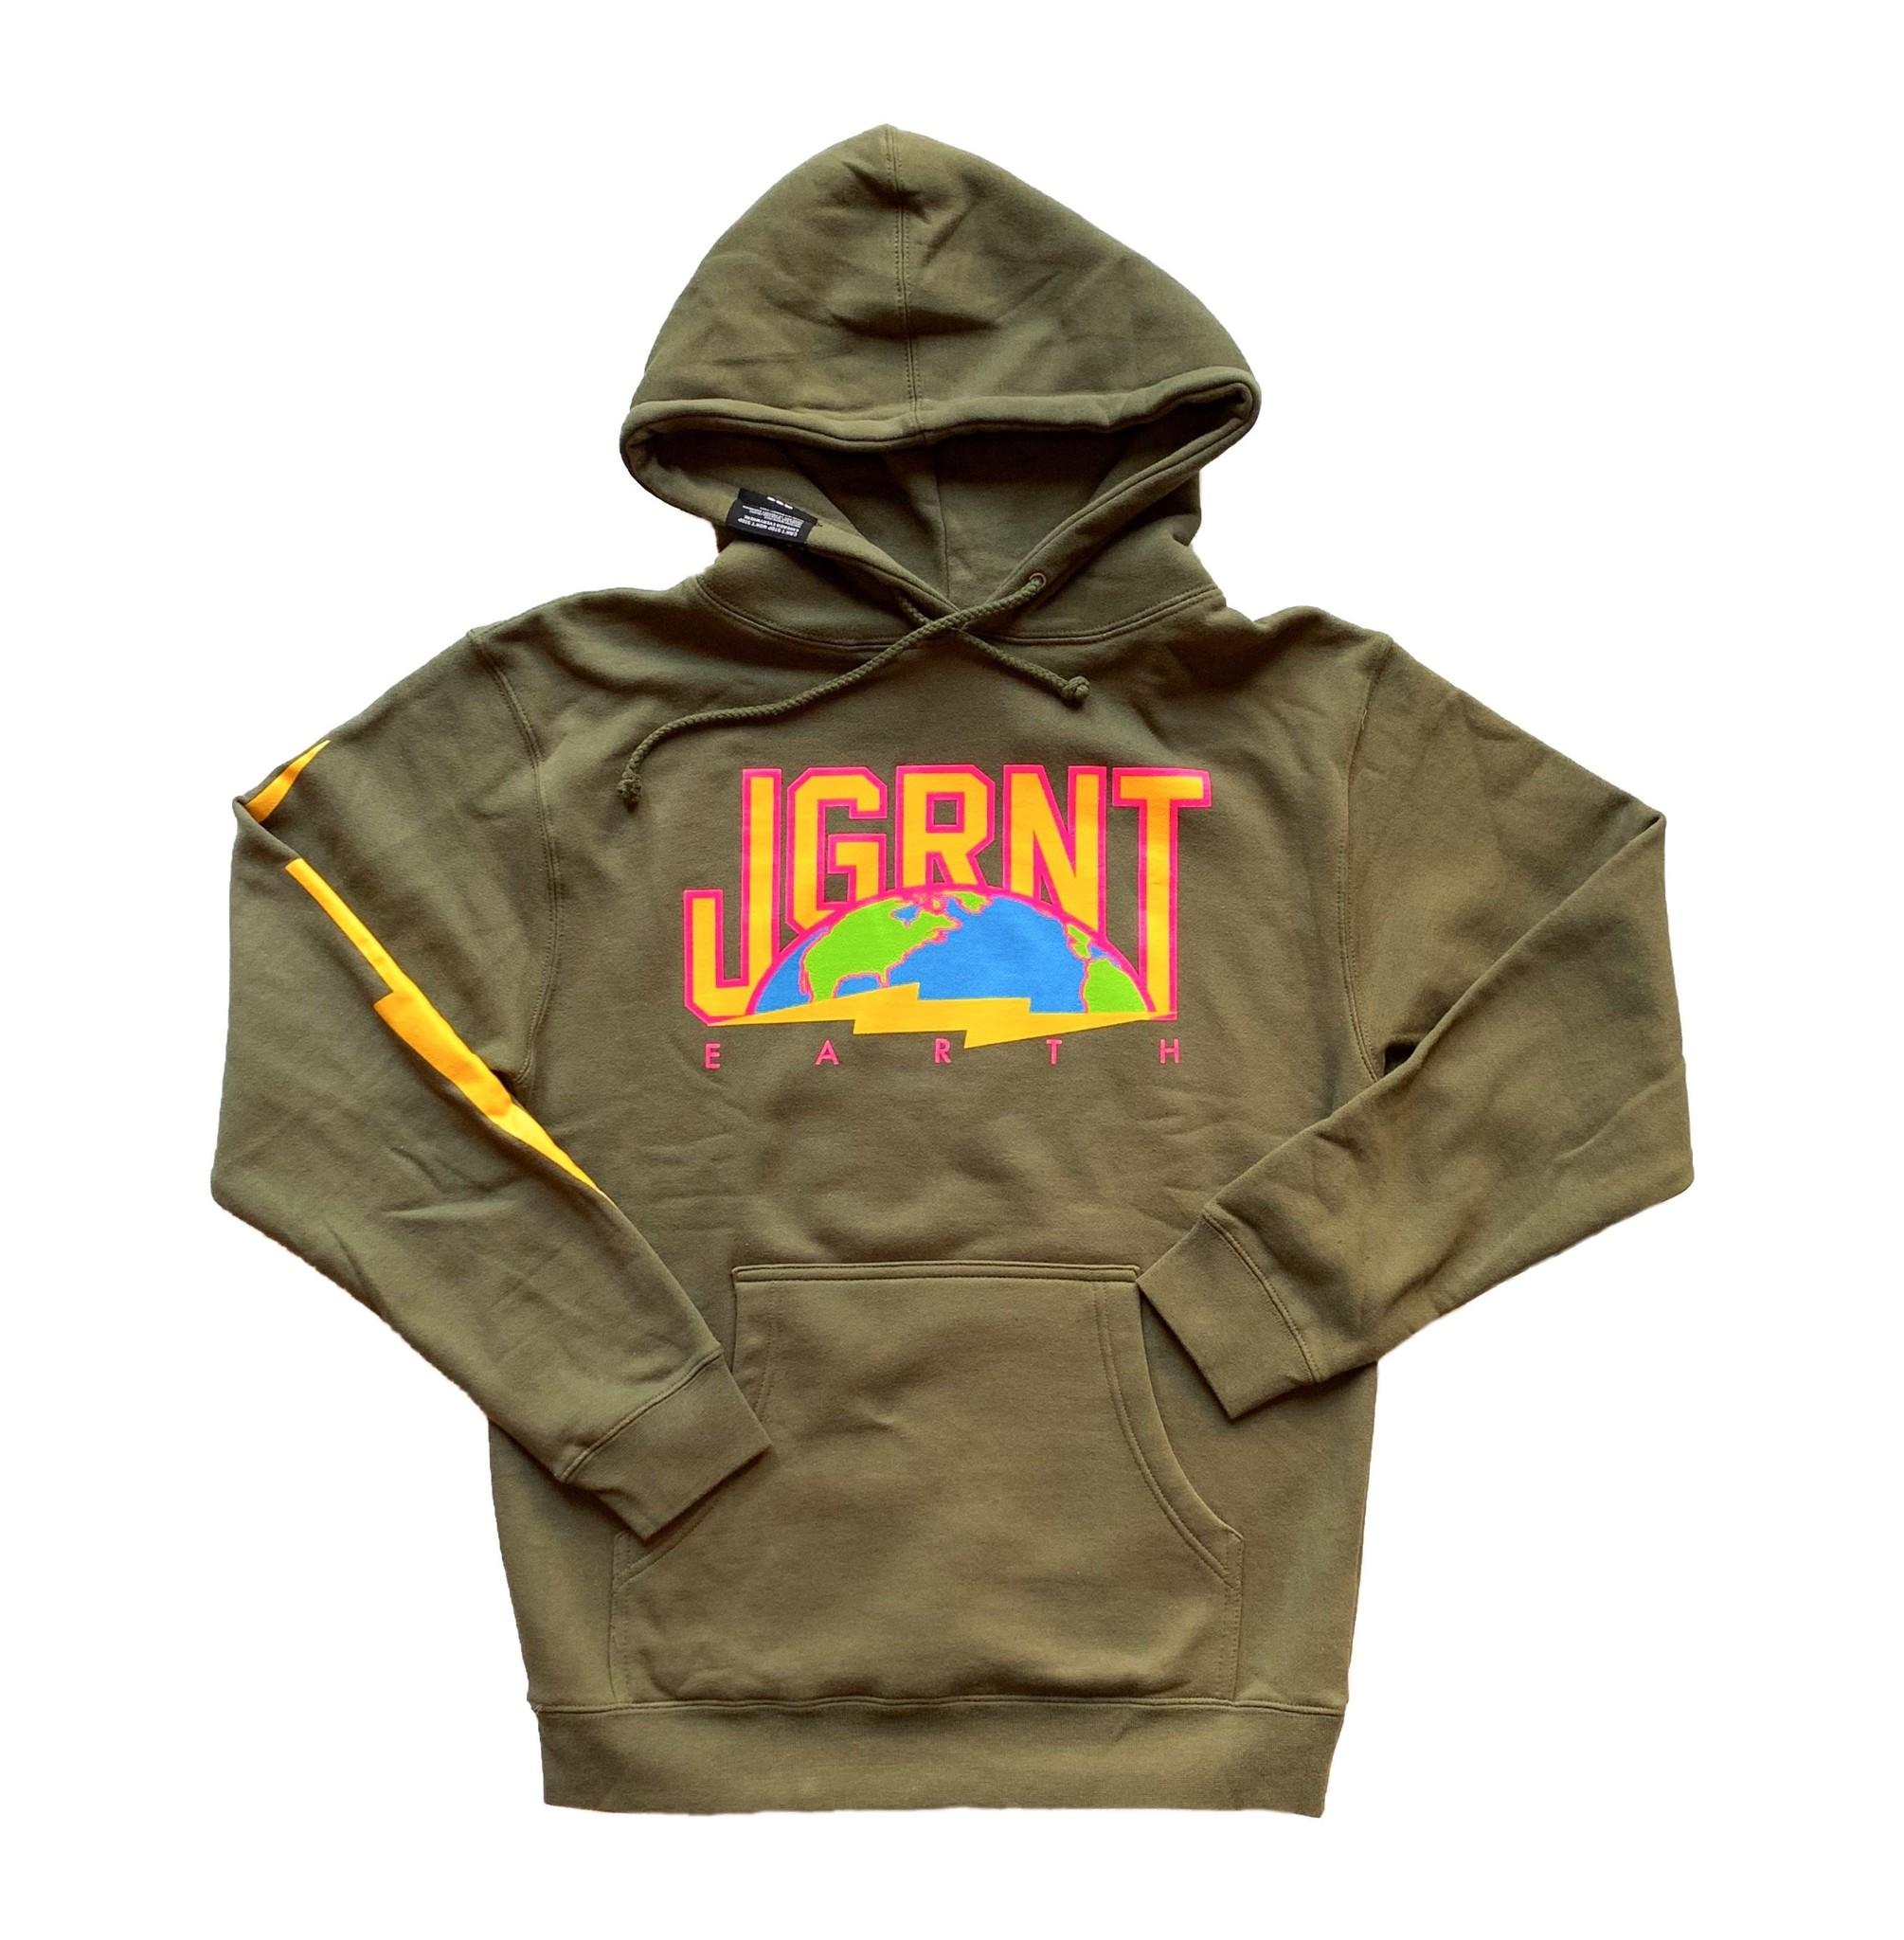 Jugrnaut Jugrnaut Earth Hoodie Army